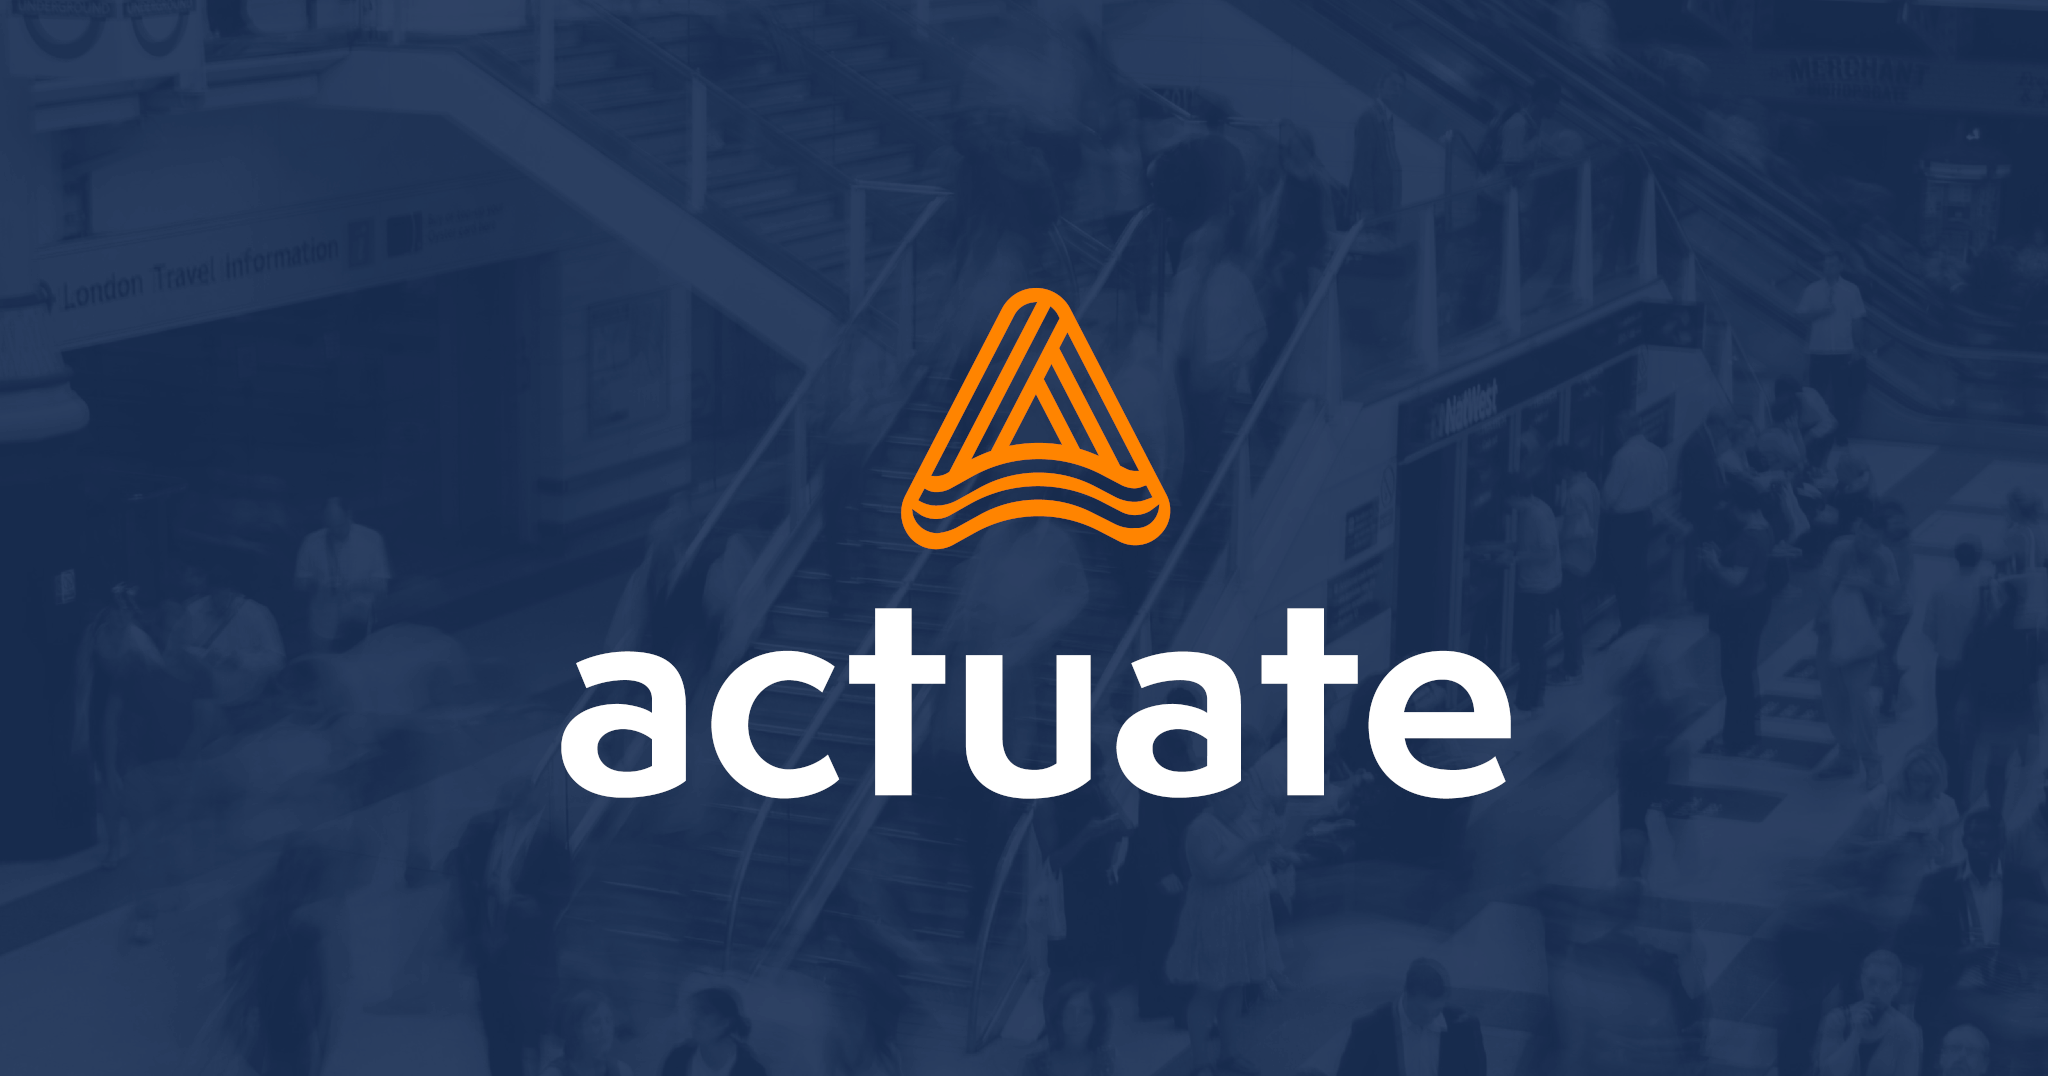 Acuate Logo for LinkedIn